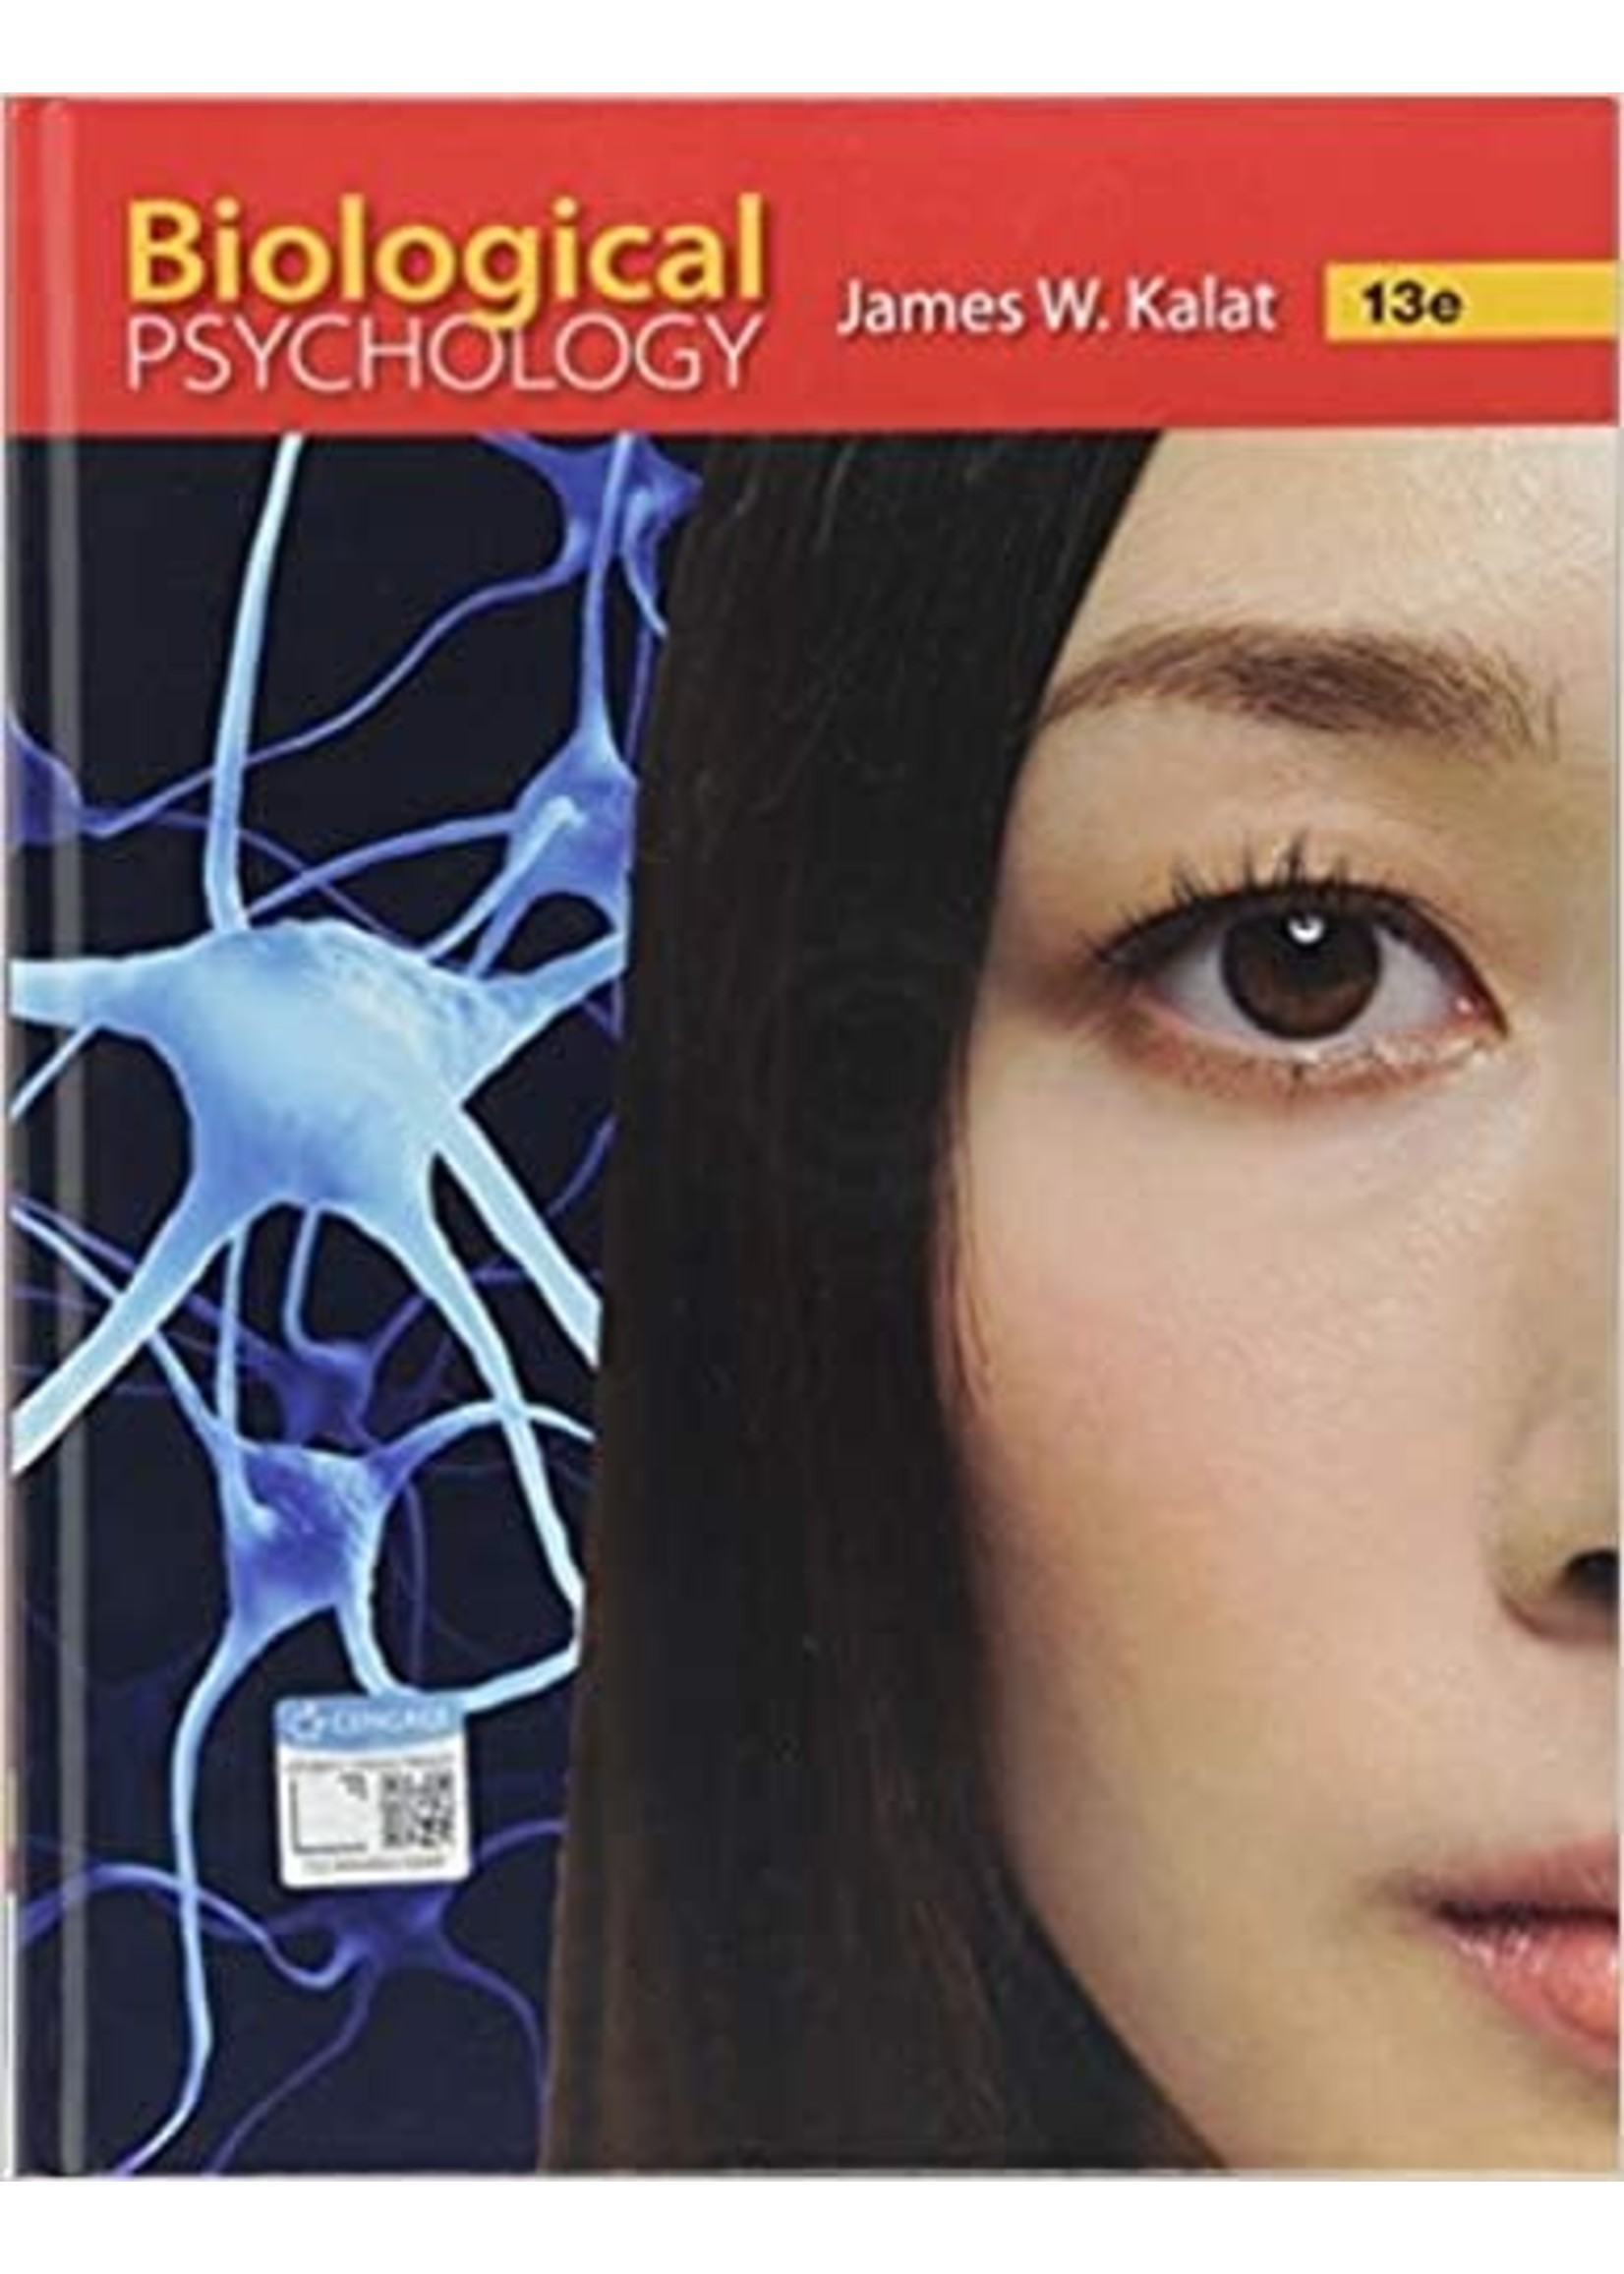 PSYC425 BILOGICAL PSYCHOLOGY (RENTAL)